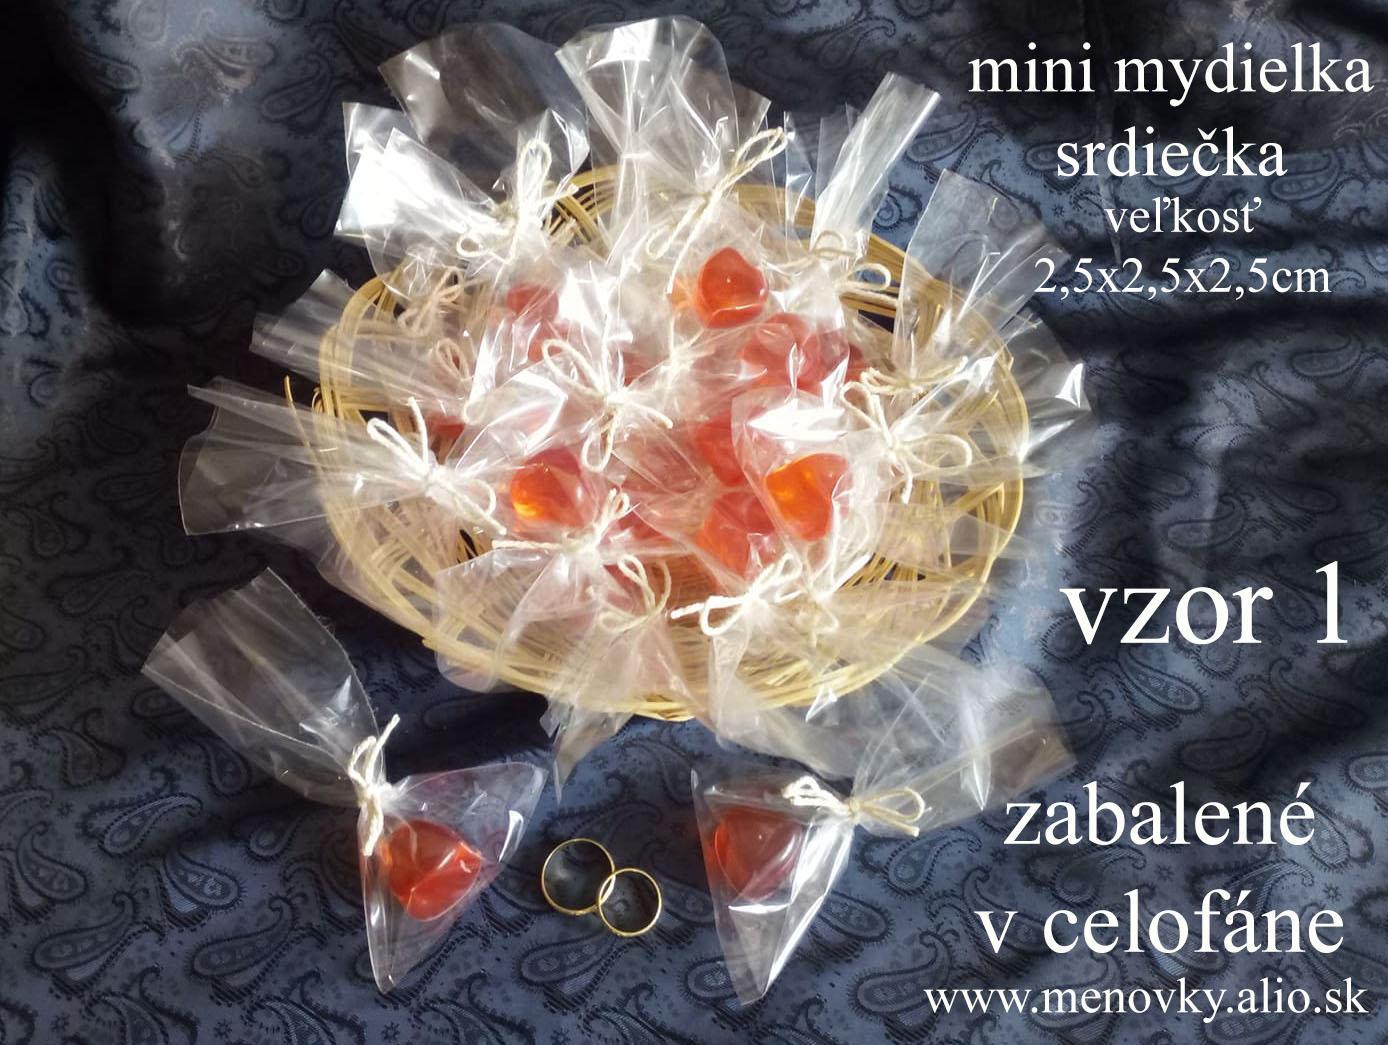 Svadobne mini  mydielka - glycerinove - Obrázok č. 2